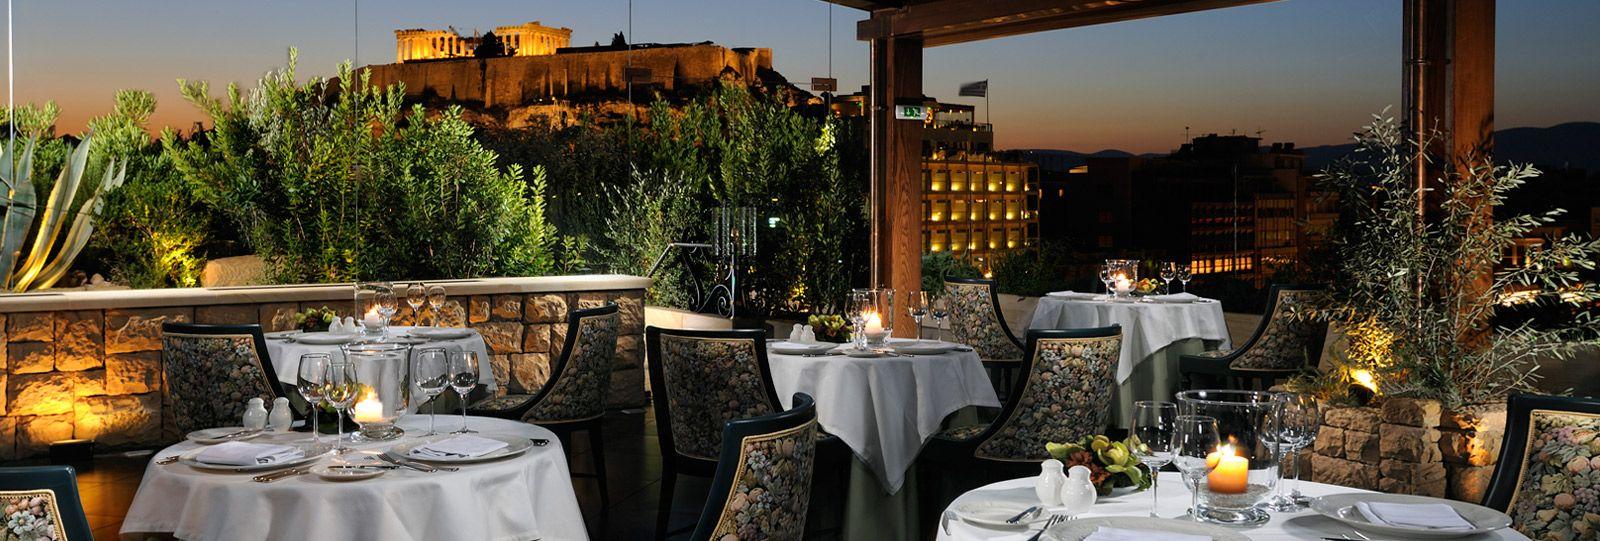 Athens hotel Royal Olympic | Luxury hotel Athens